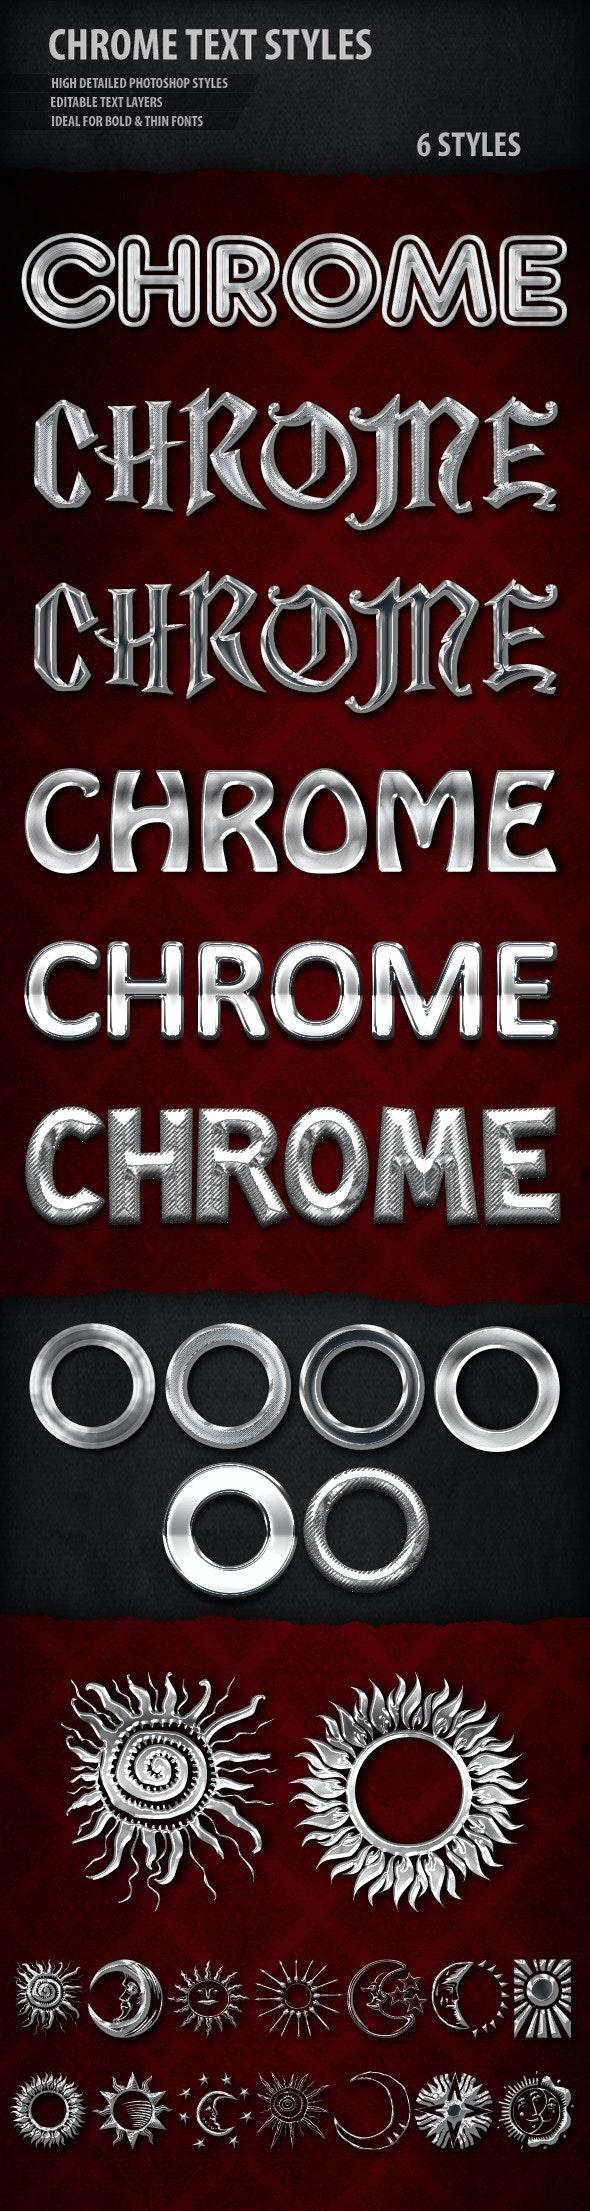 Chrome Text Styles - Styles Photoshop